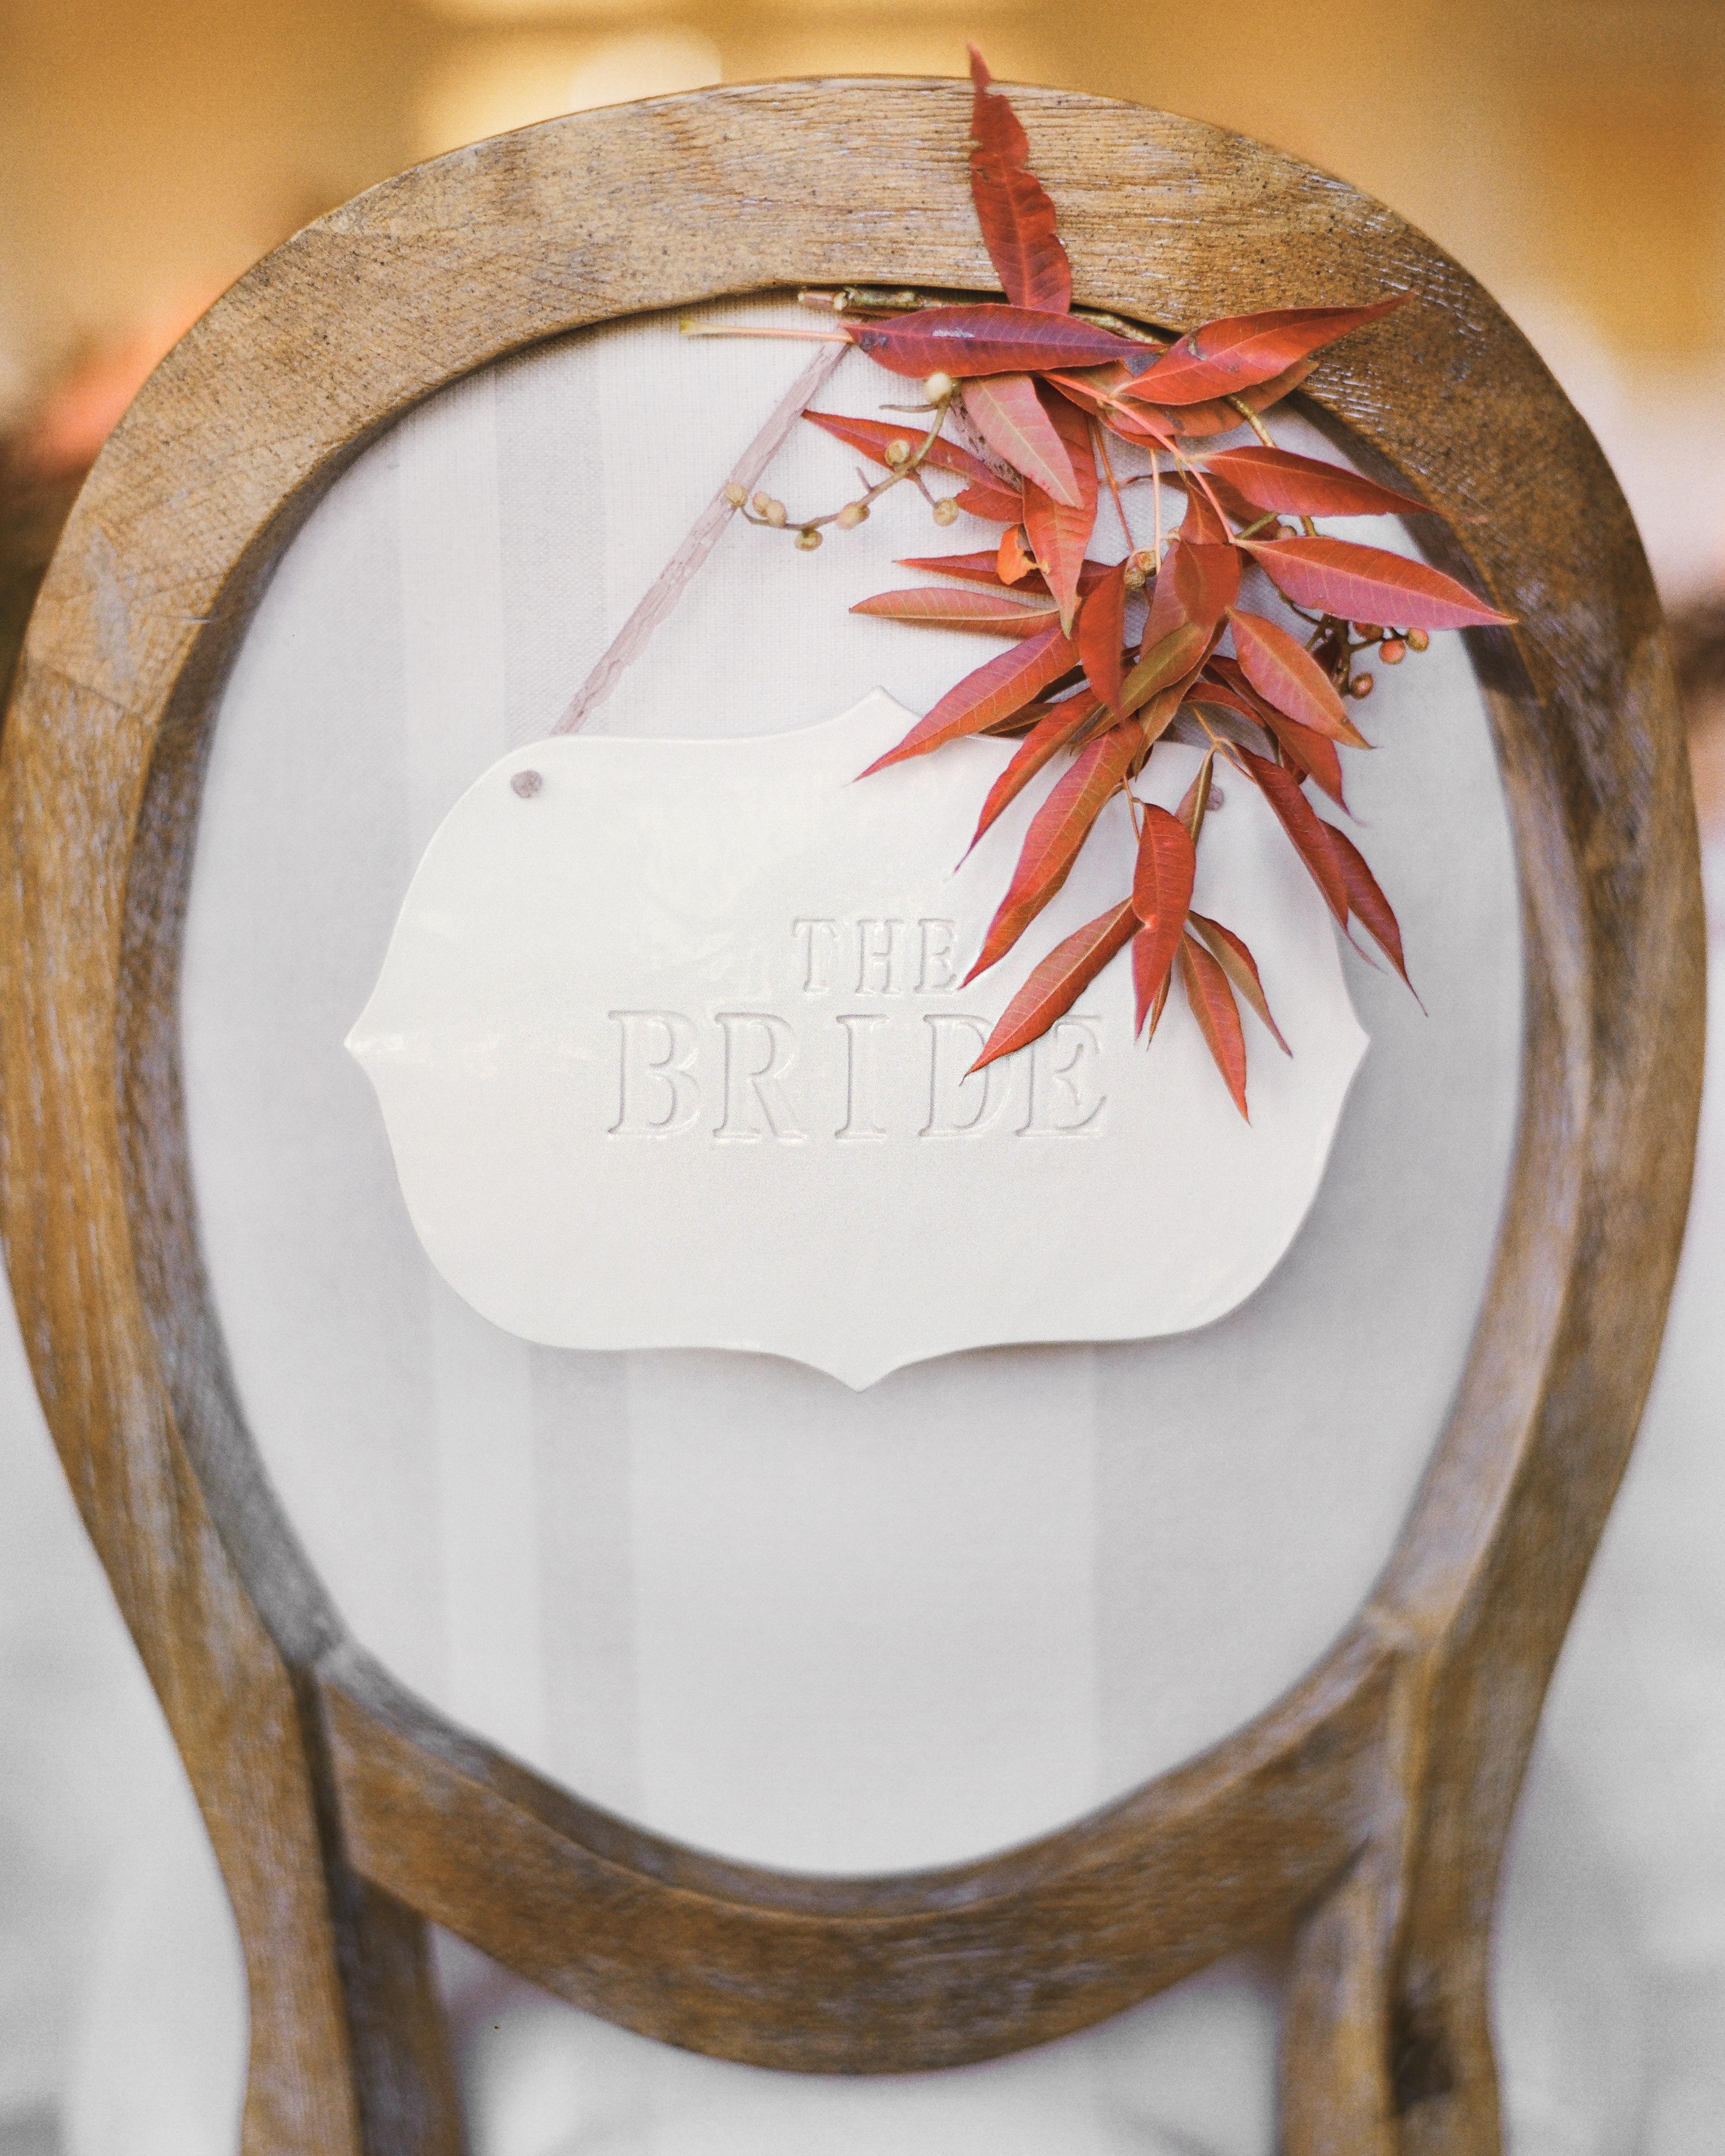 wooden-chair-bride-autumn-leaf-elizabeth-messina-162-mwds110806.jpg